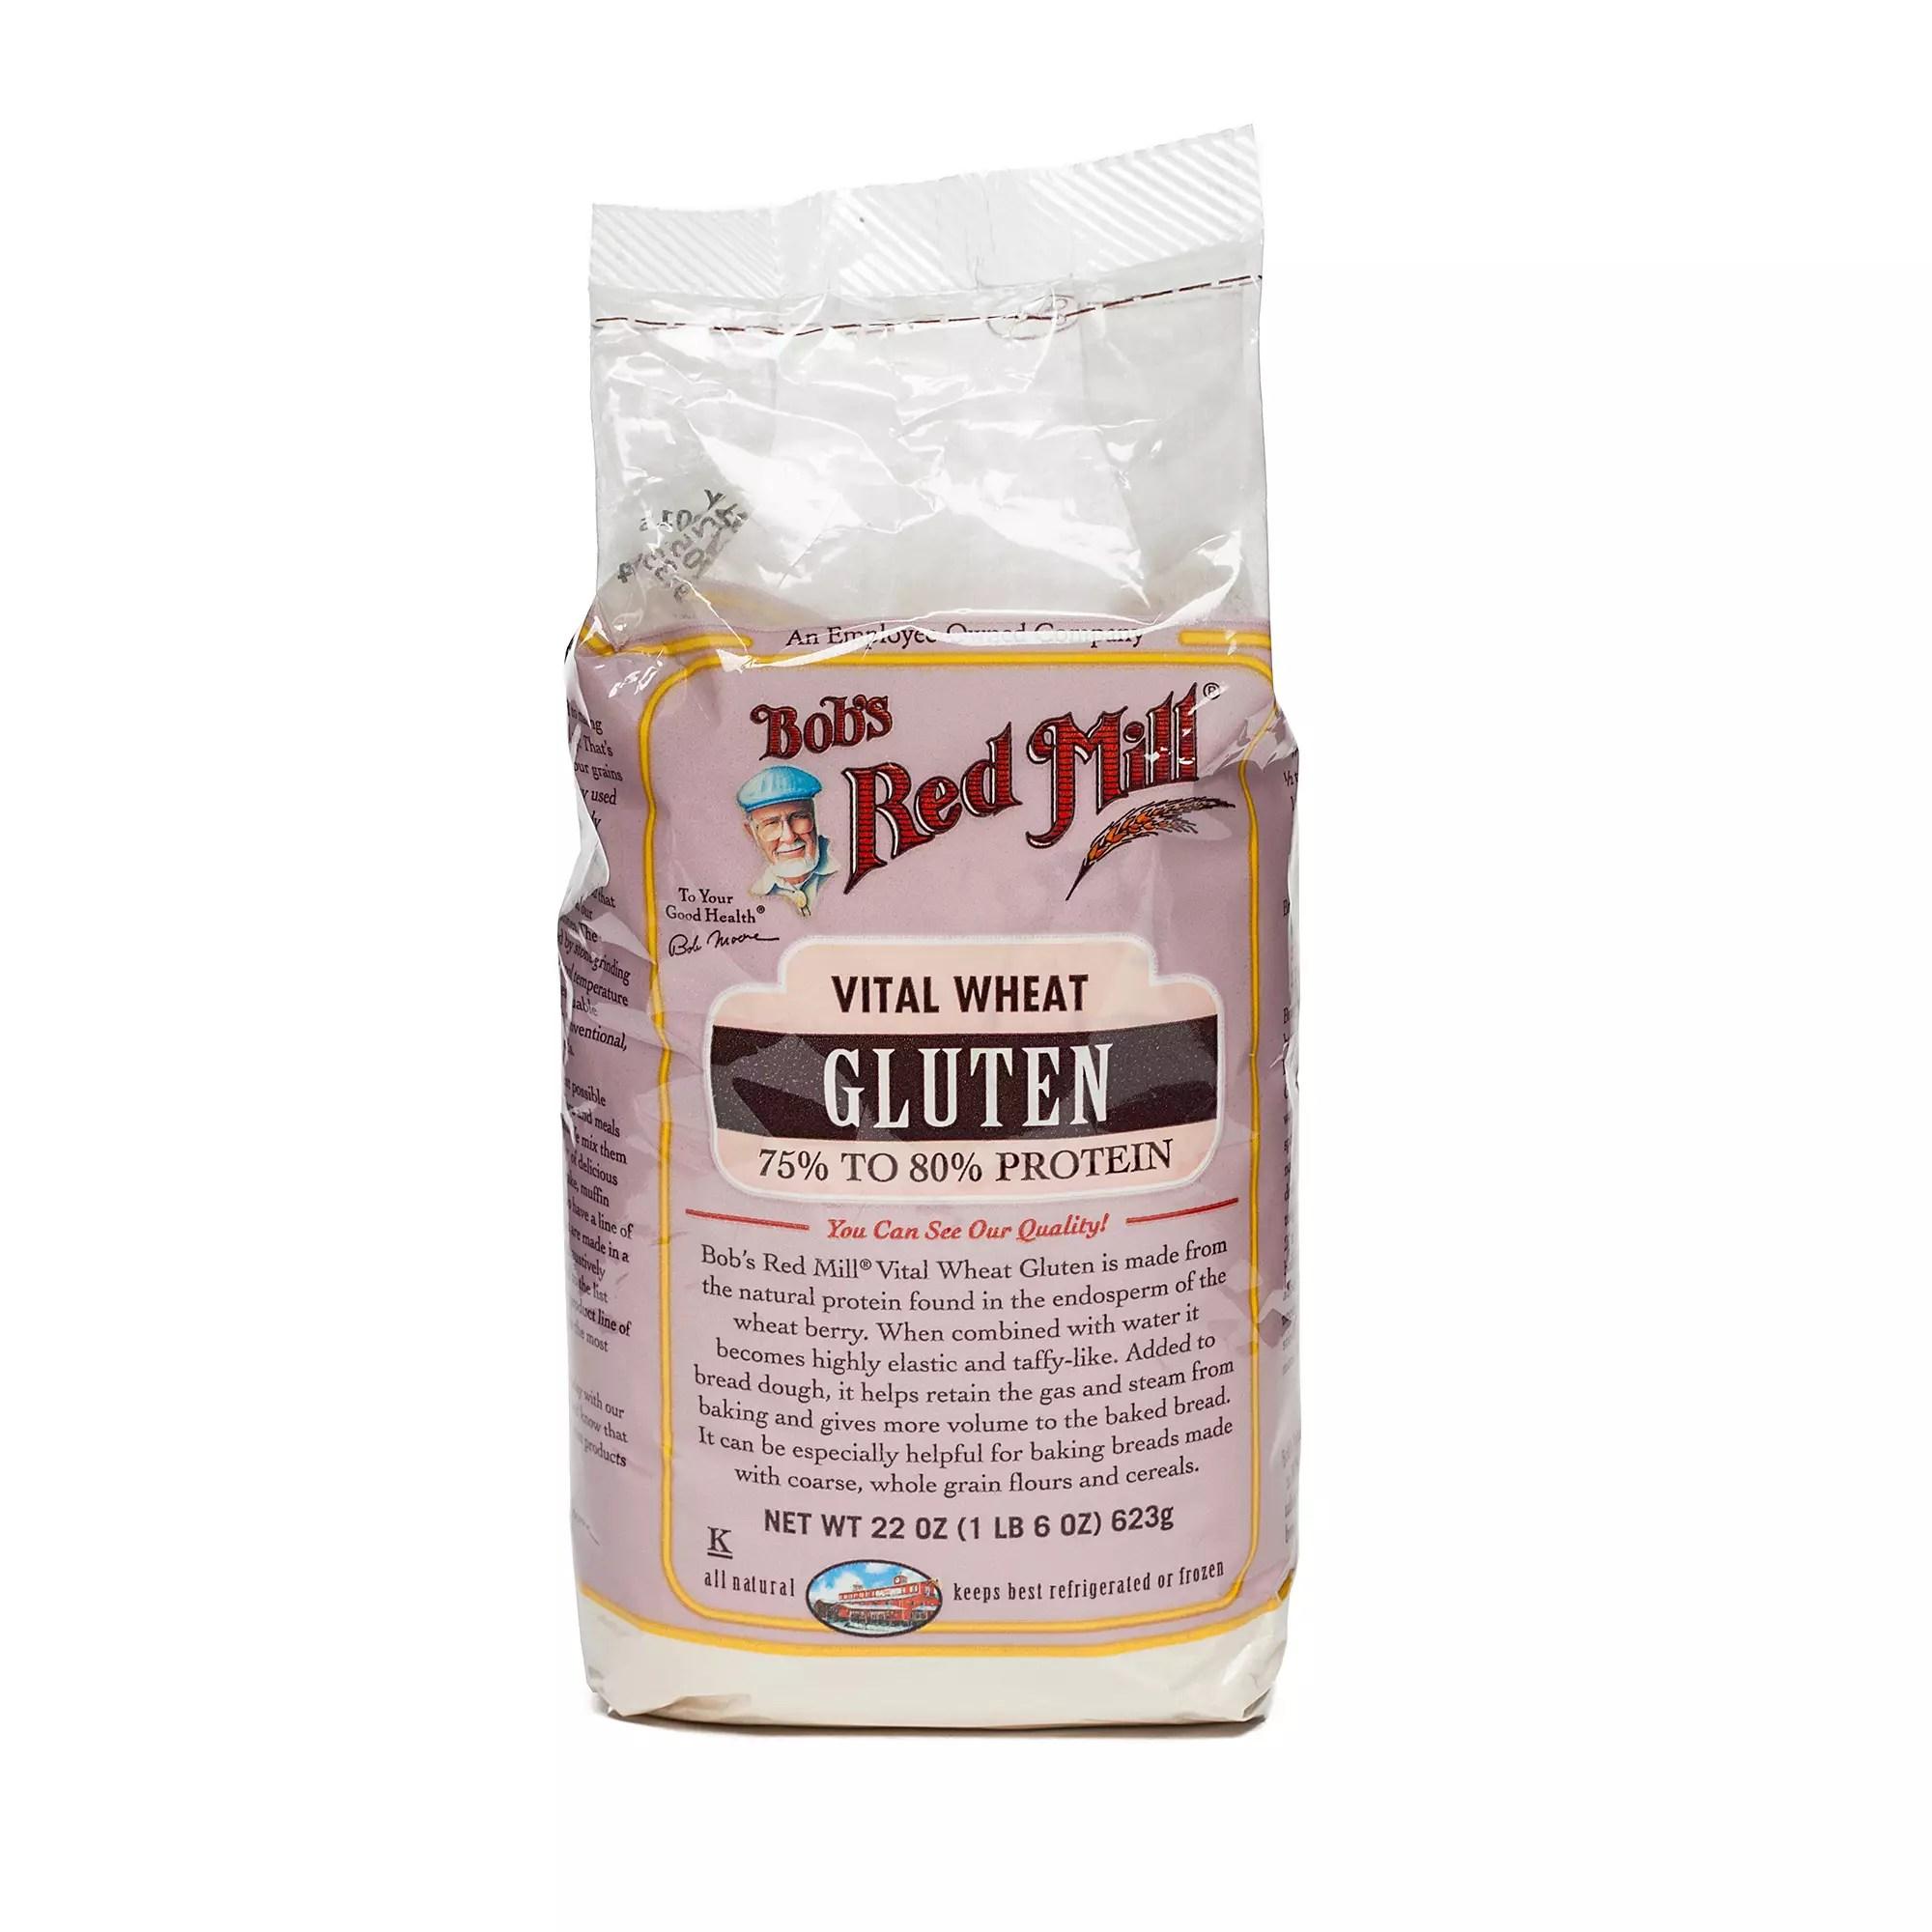 Vital Wheat Gluten by Bob's Red Mill - Thrive Market